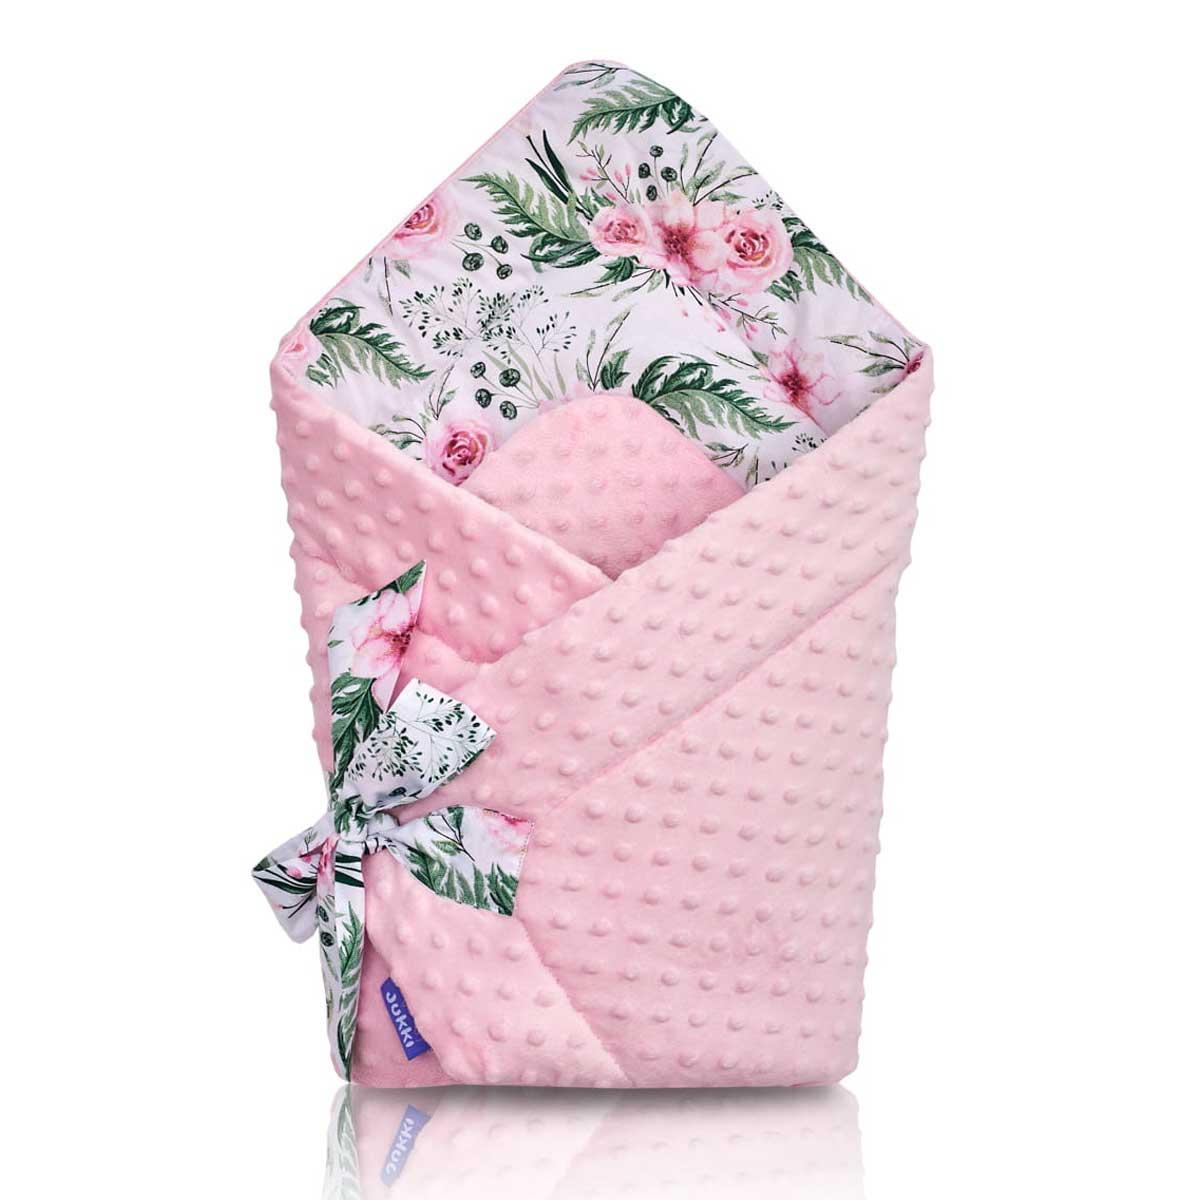 Jukki Baby Wrap - Jardin Rose